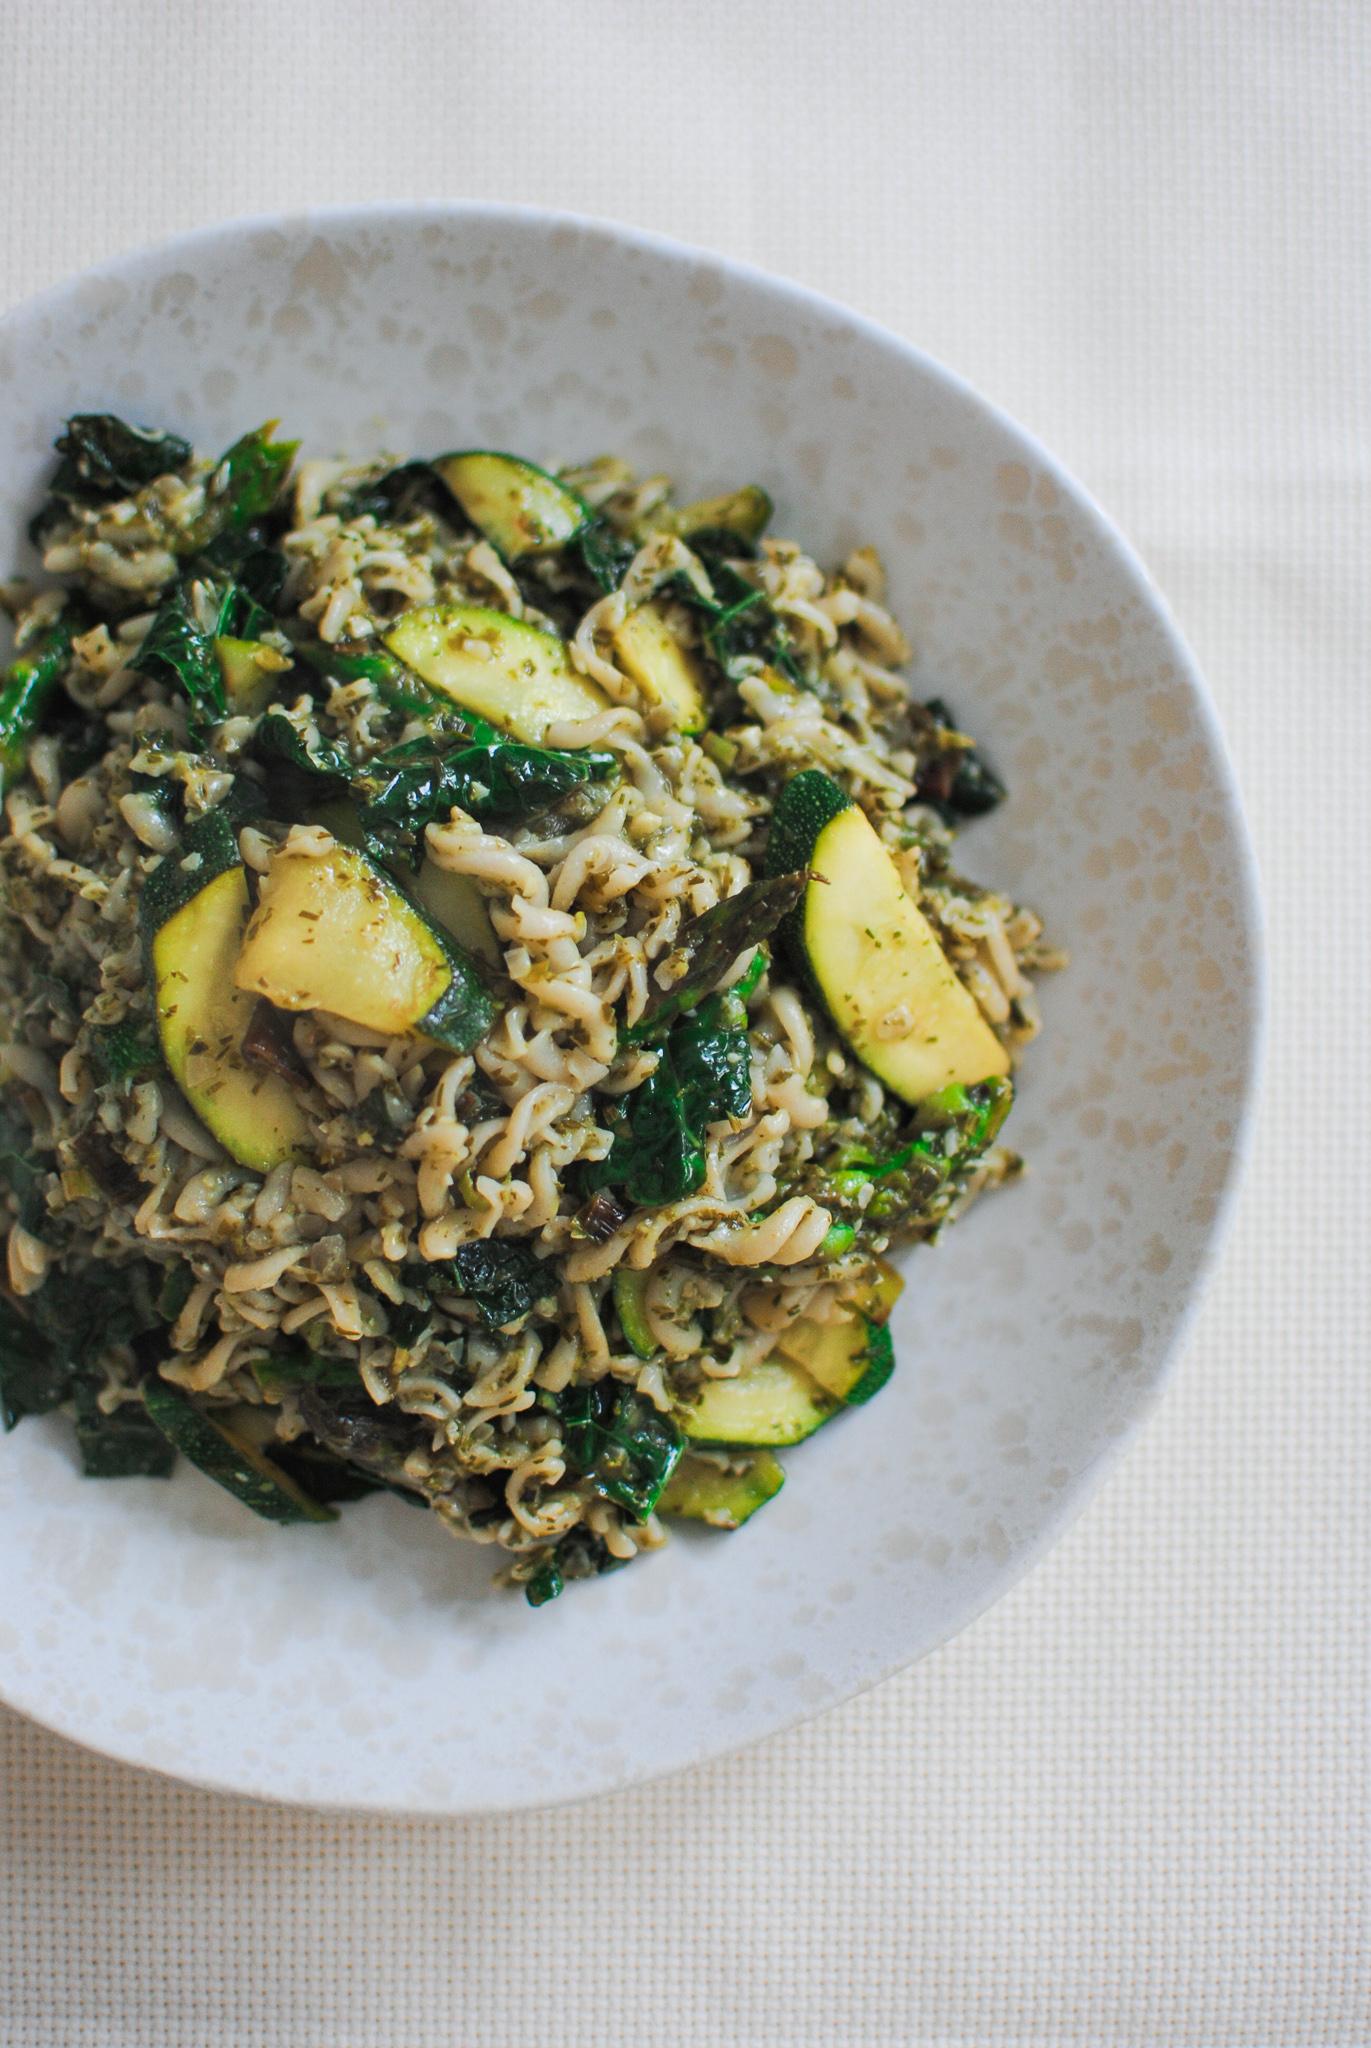 massa com pesto e legumes primaveris | please consider | joana limao